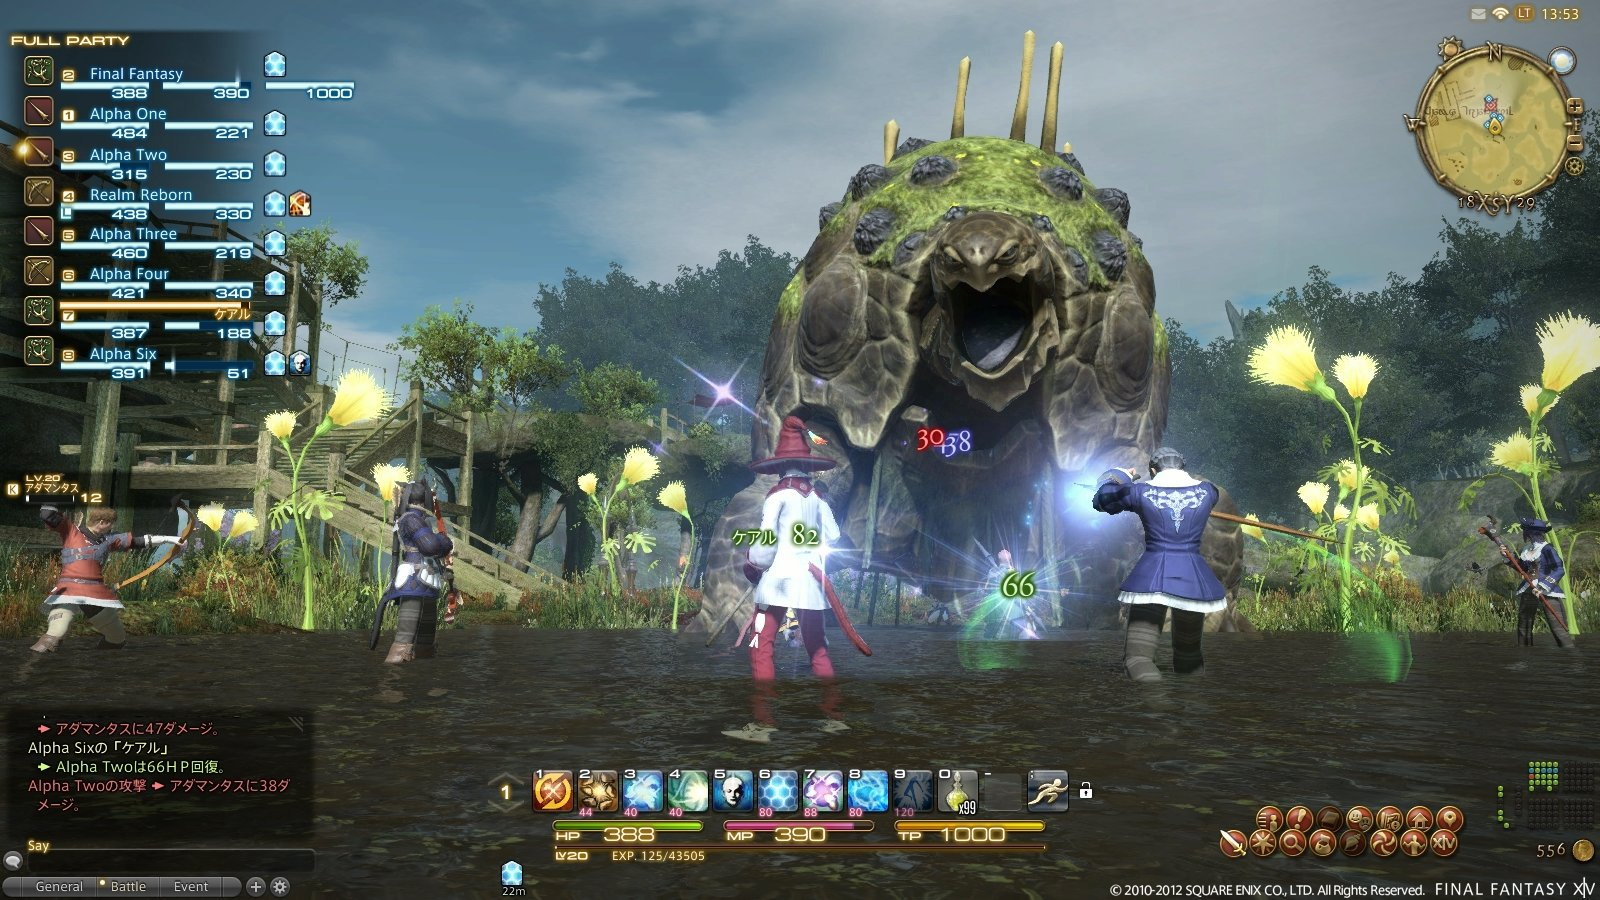 Final Fantasy XIV New Expansion Stormblood Gets